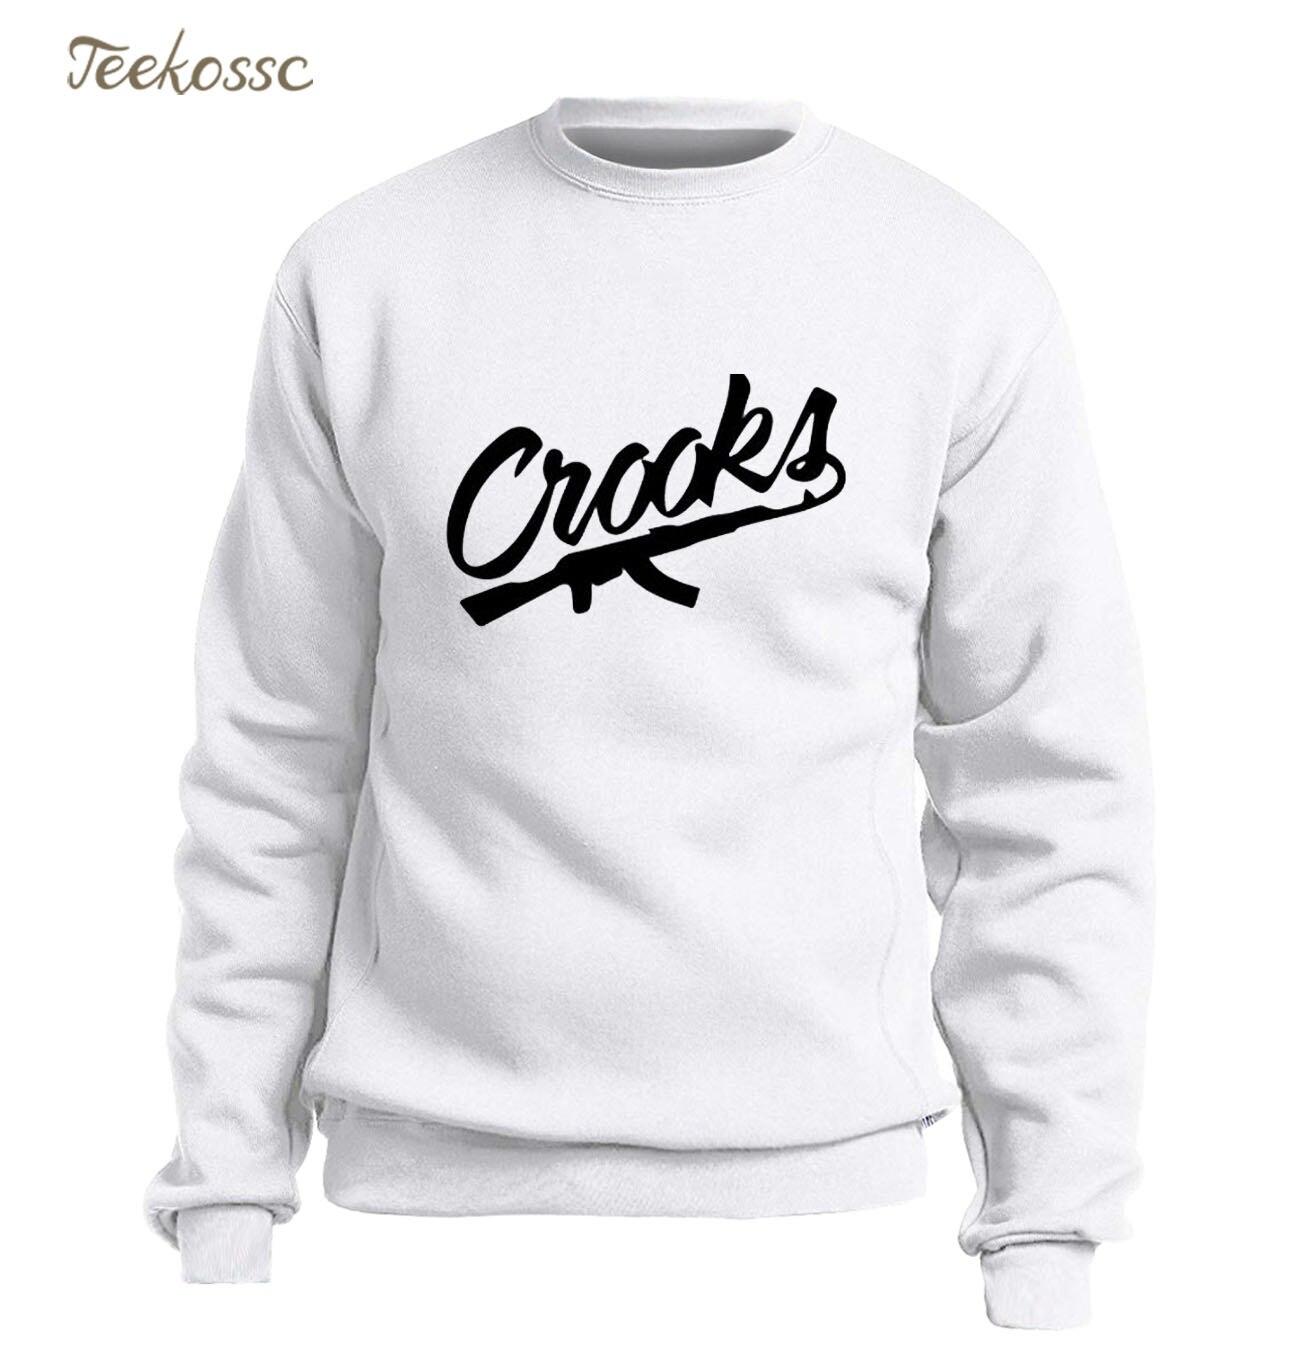 b56566c47333 Graphic Design Crew Neck Sweatshirts - BCD Tofu House